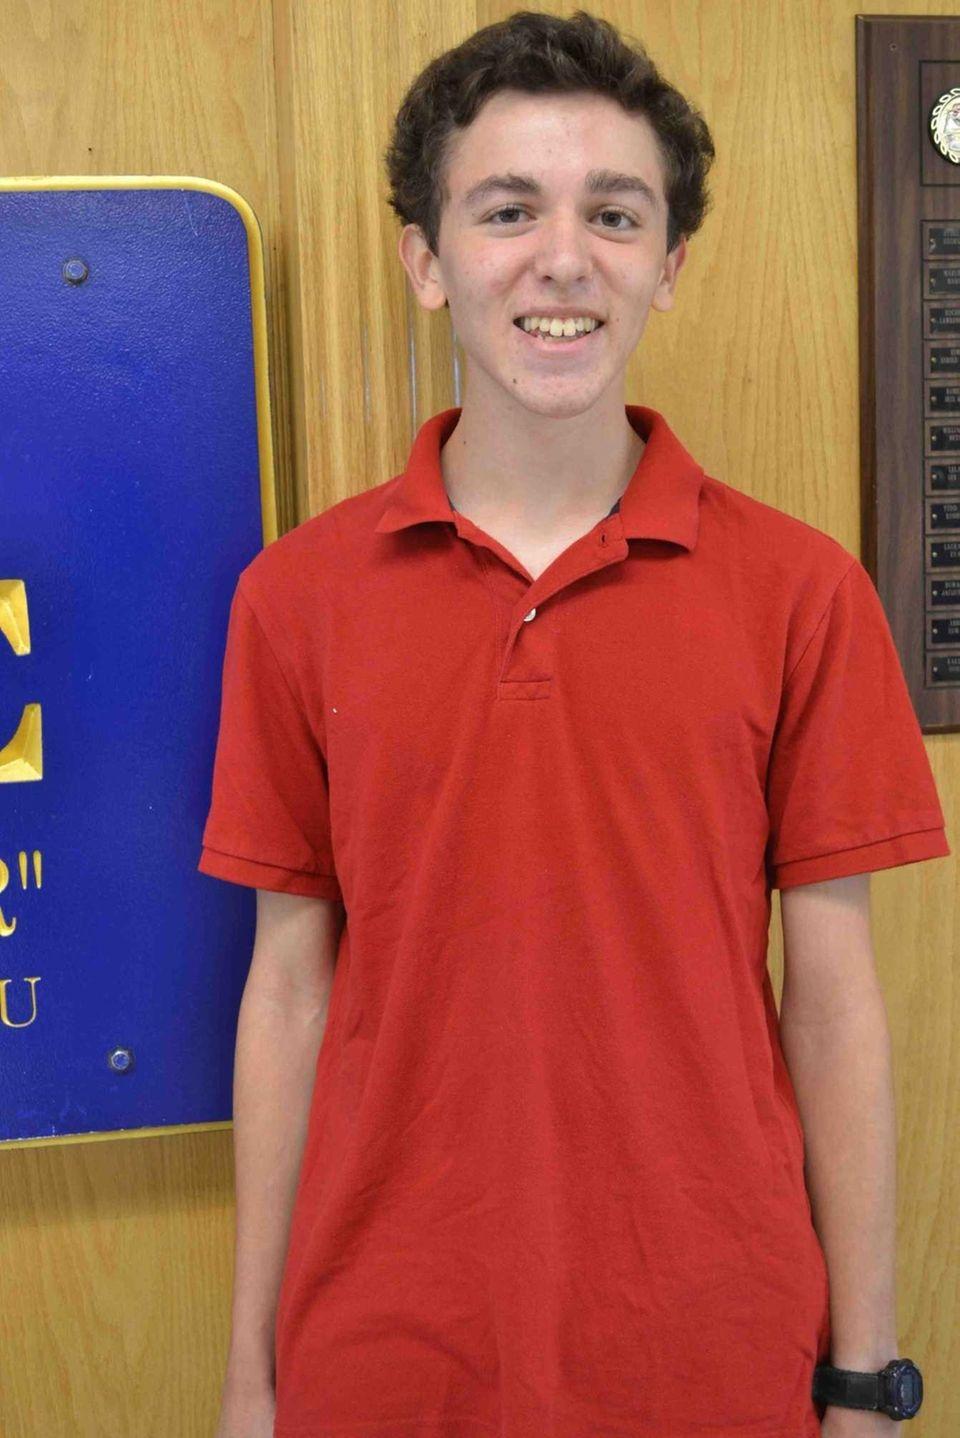 Jonathan Kapilian, 16, a junior at Long Beach